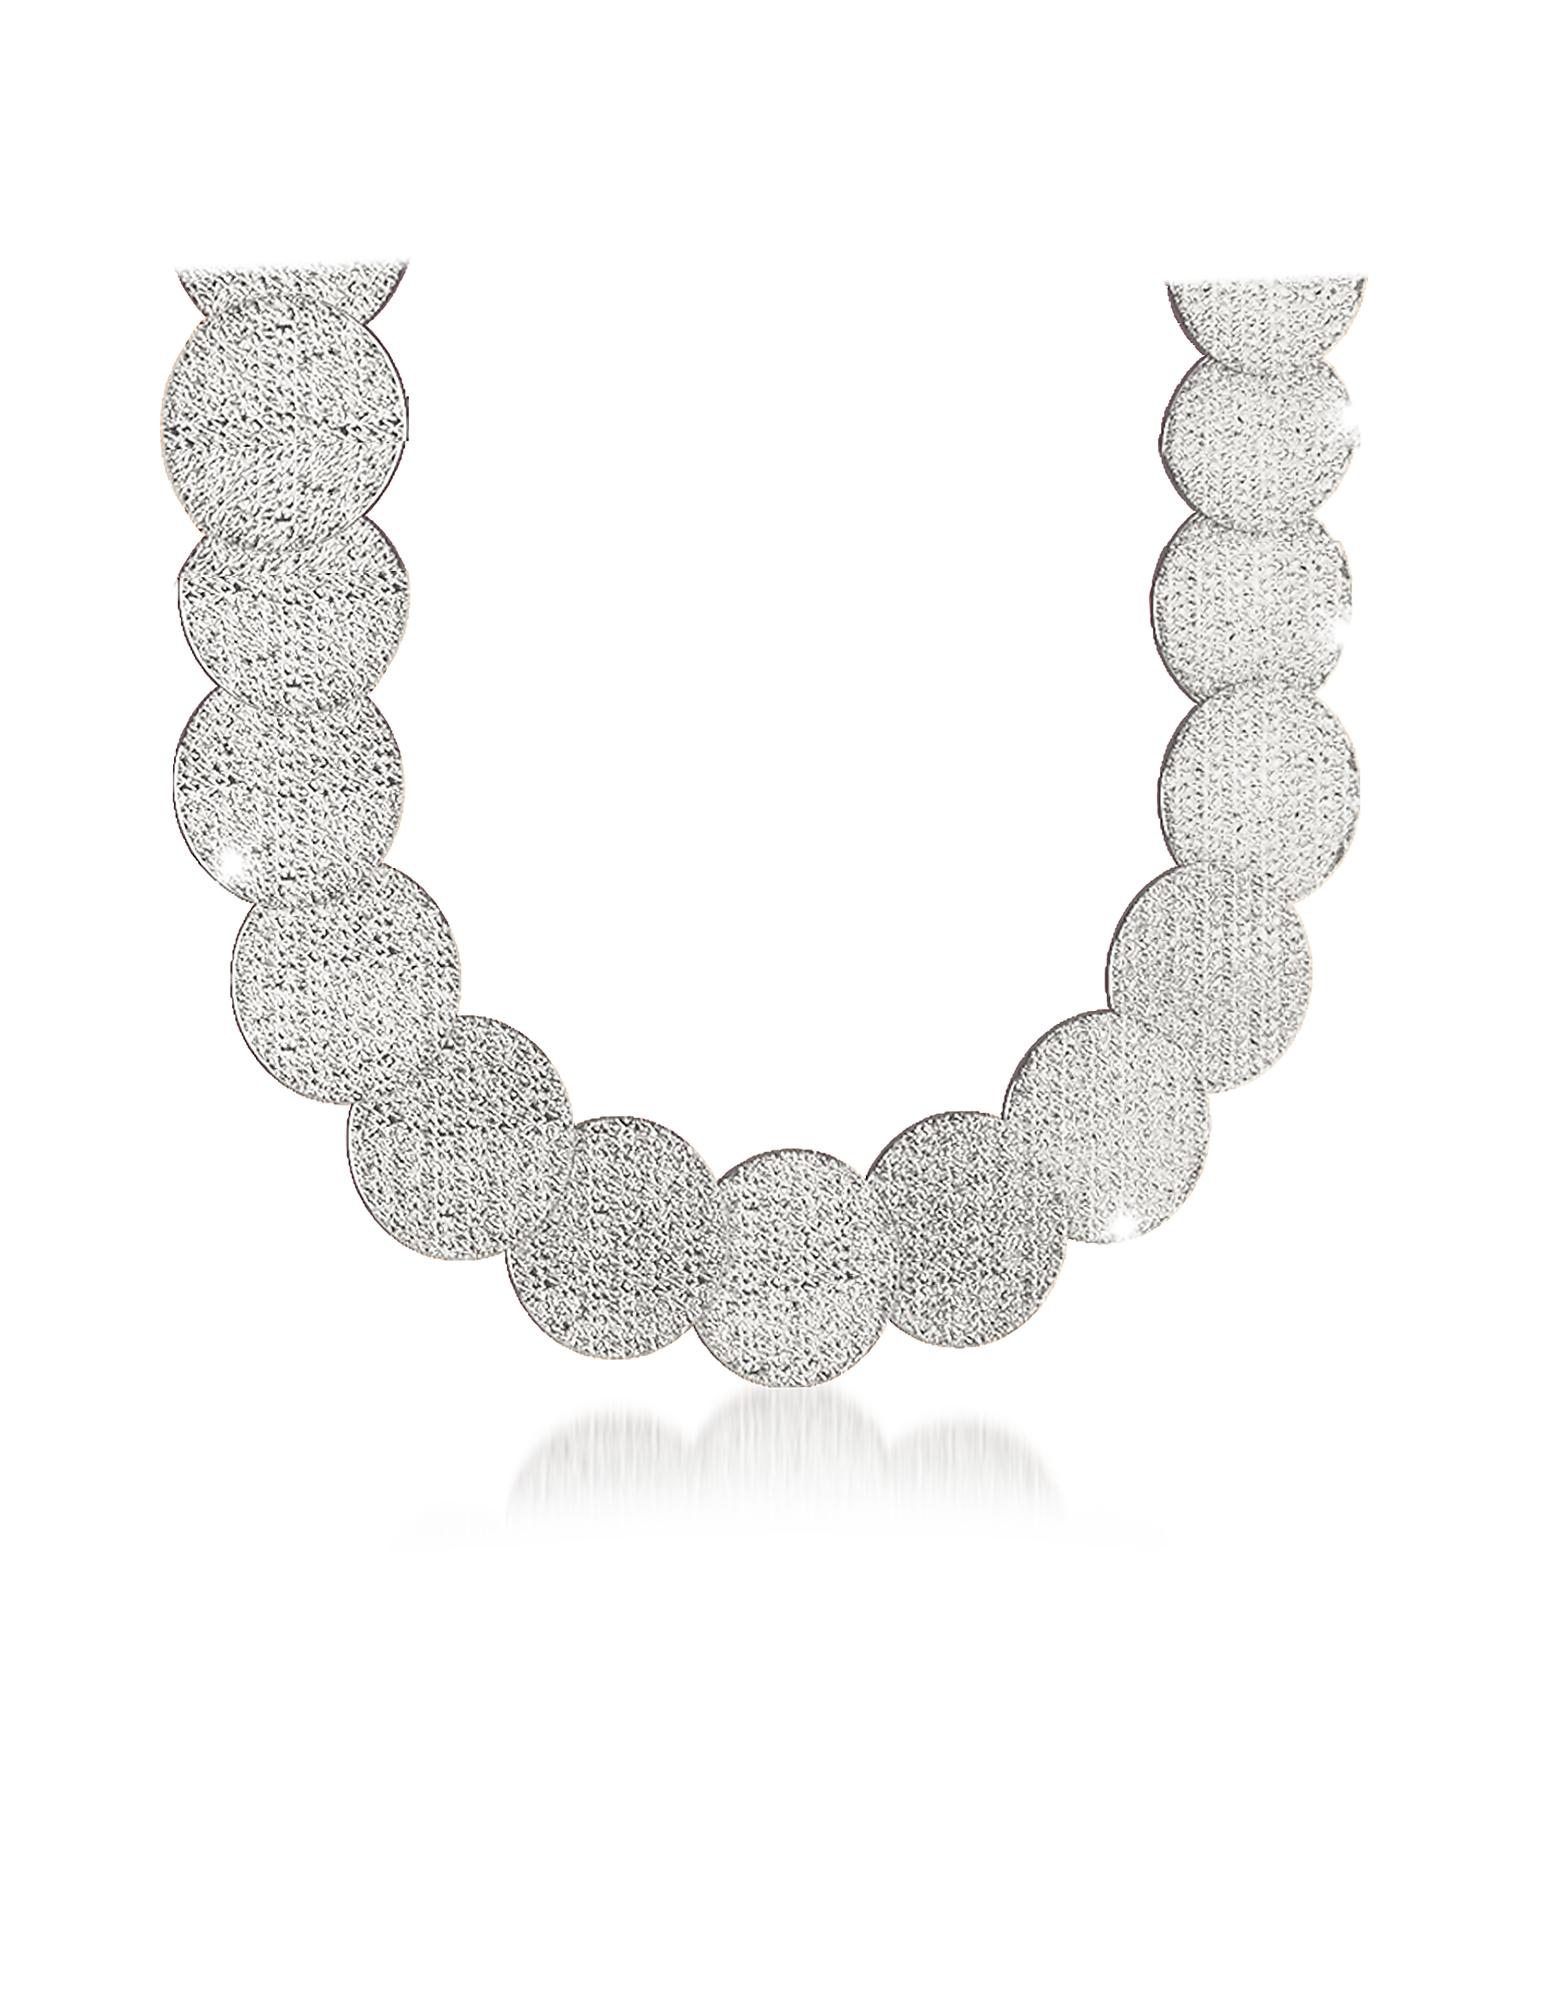 R-ZERO Rhodium Over Bronze Necklace, Silver